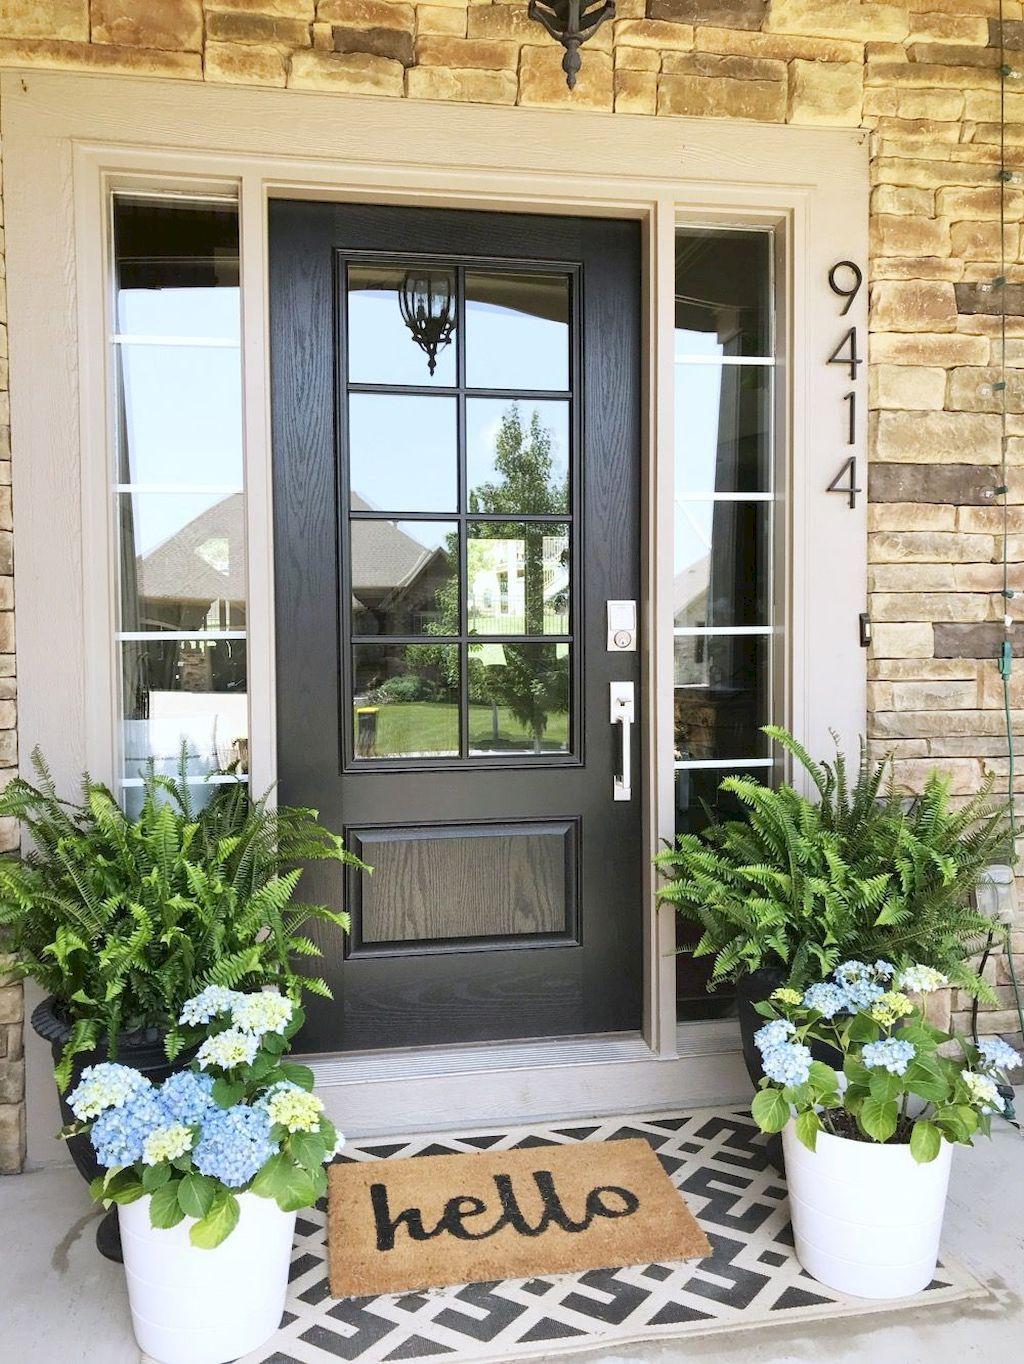 Cool 50 Stunning Spring Porch Decorating Ideas Source Link Https Decornamentation Com 14544 Spring Porch Decor Front Porch Makeover Front Porch Decorating